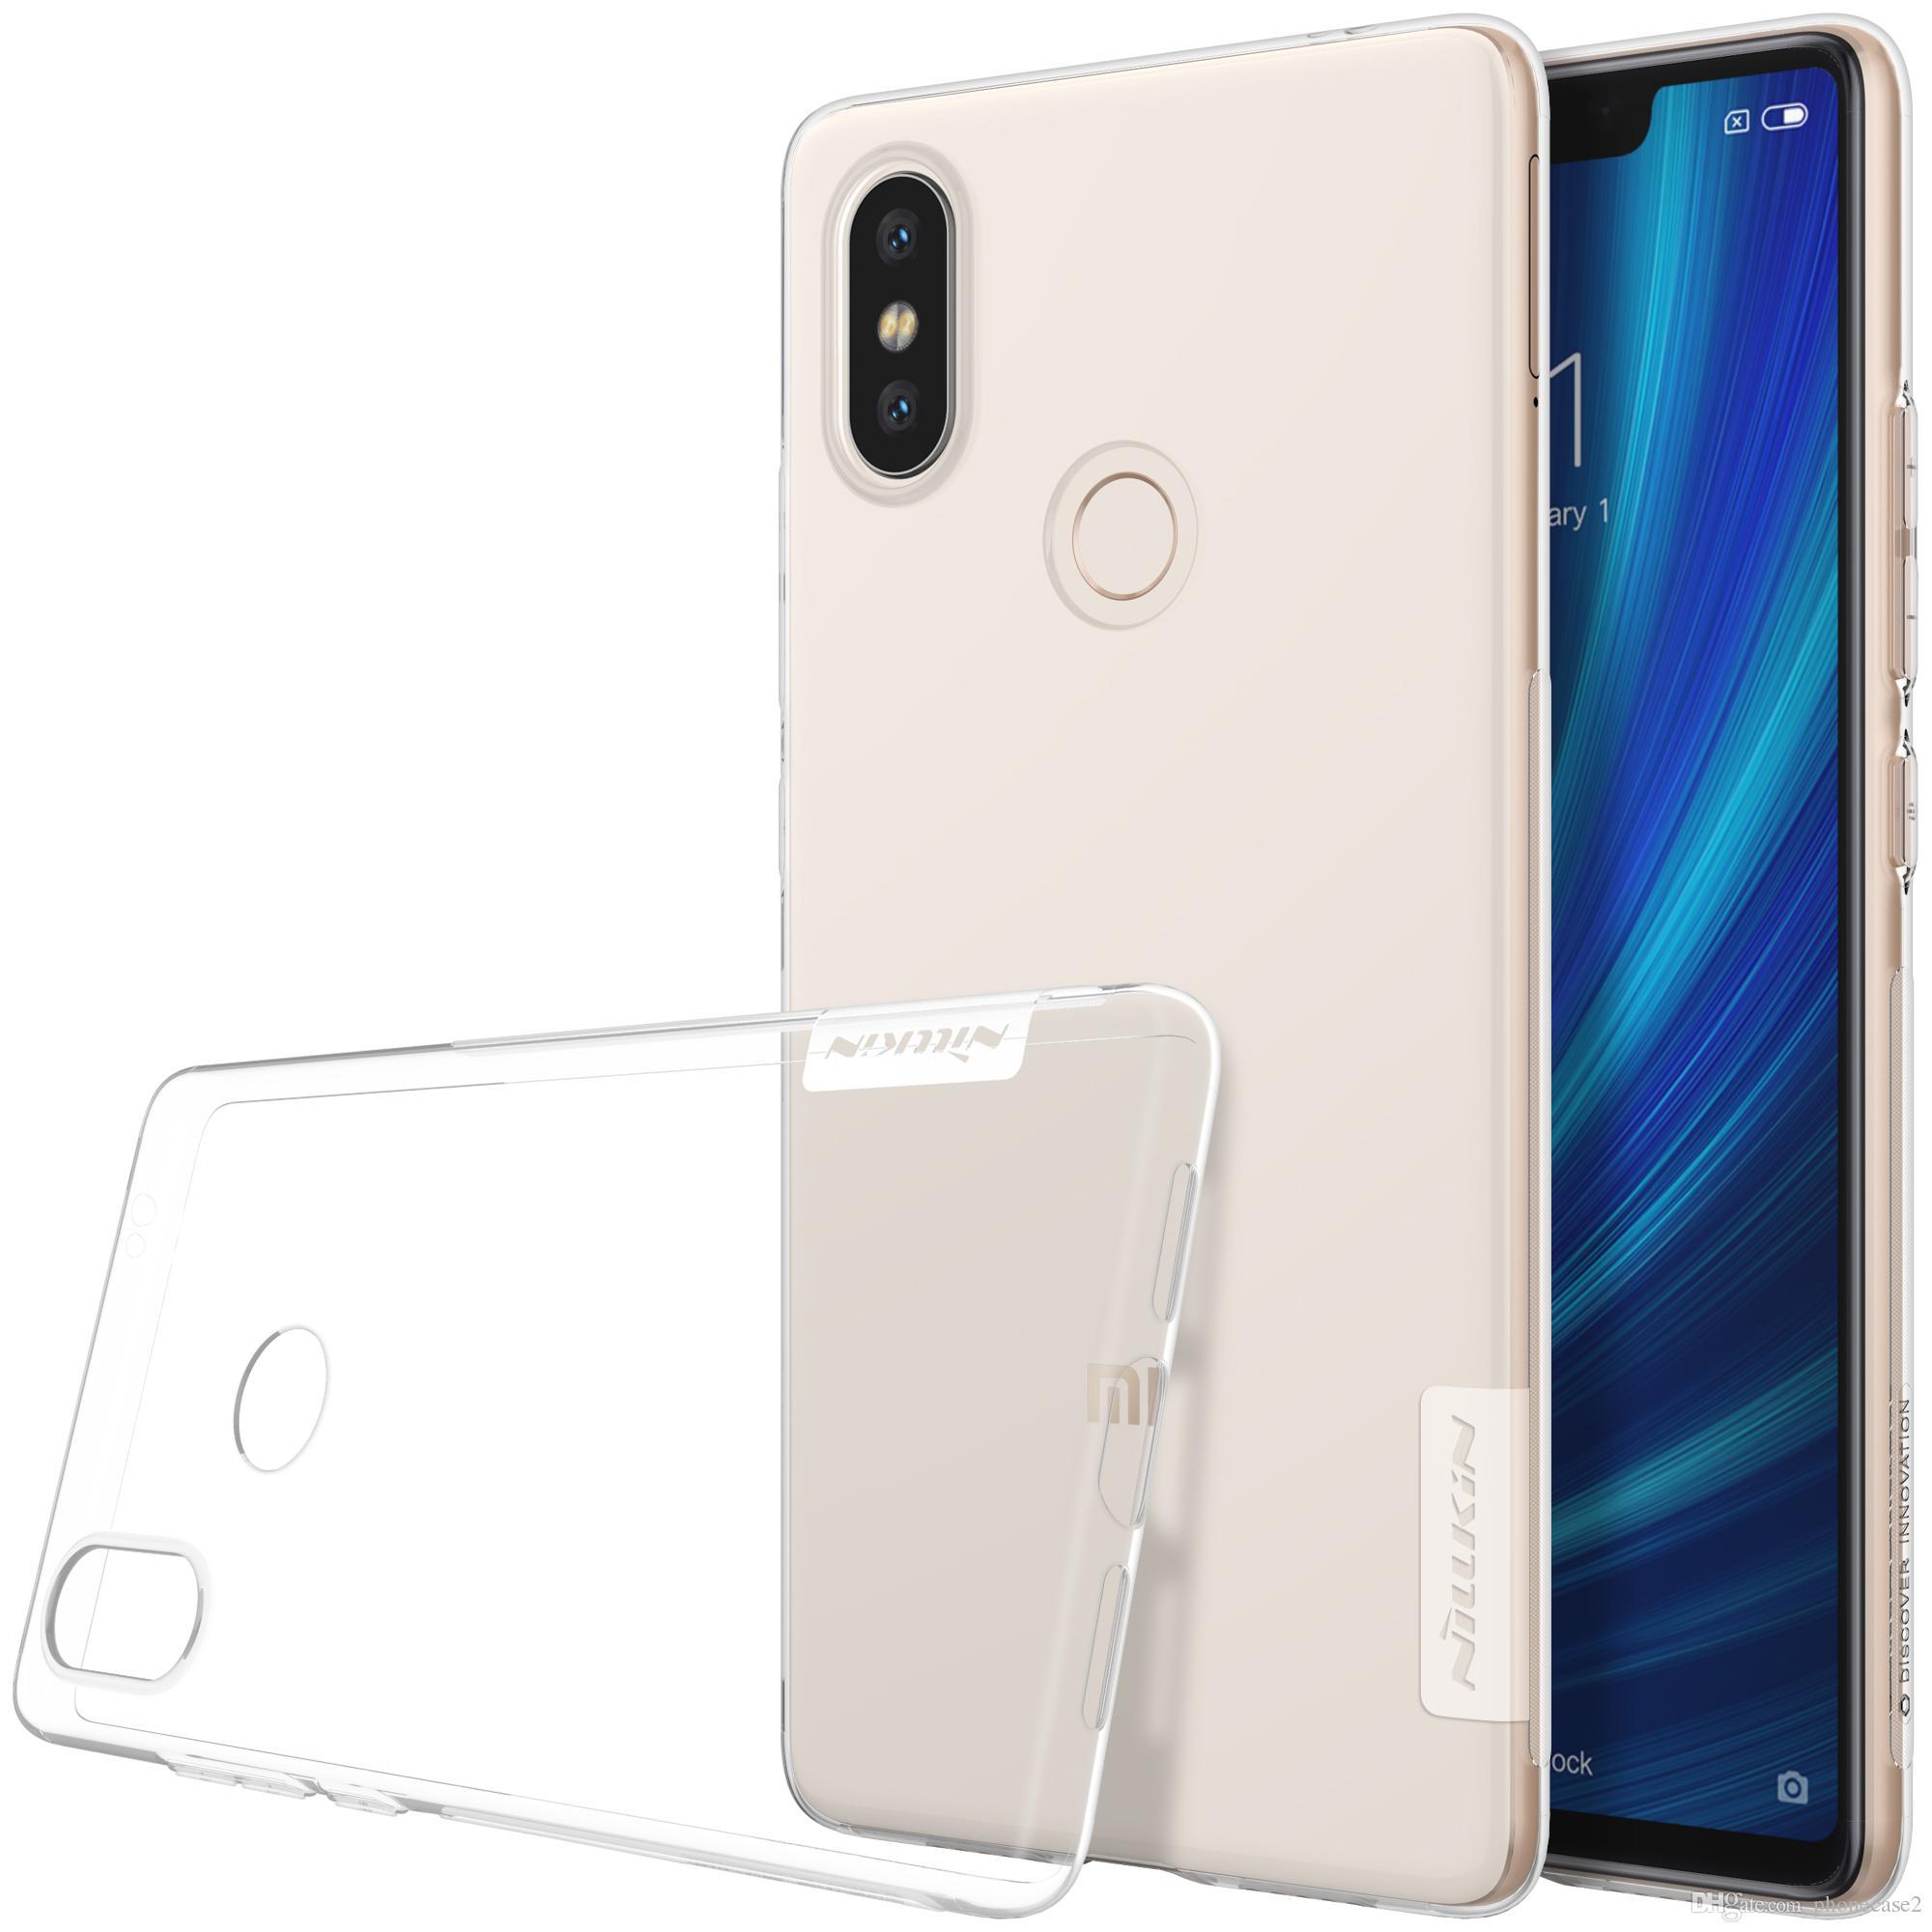 Xiaomi Mi 8 Se 6 Case Nillkin Soft Silicone Tpu Clear Phone Bag Mercury Jelly Samsung Galaxy J5 Prime Back Cases For Mi8 Mi6 Cover Online With